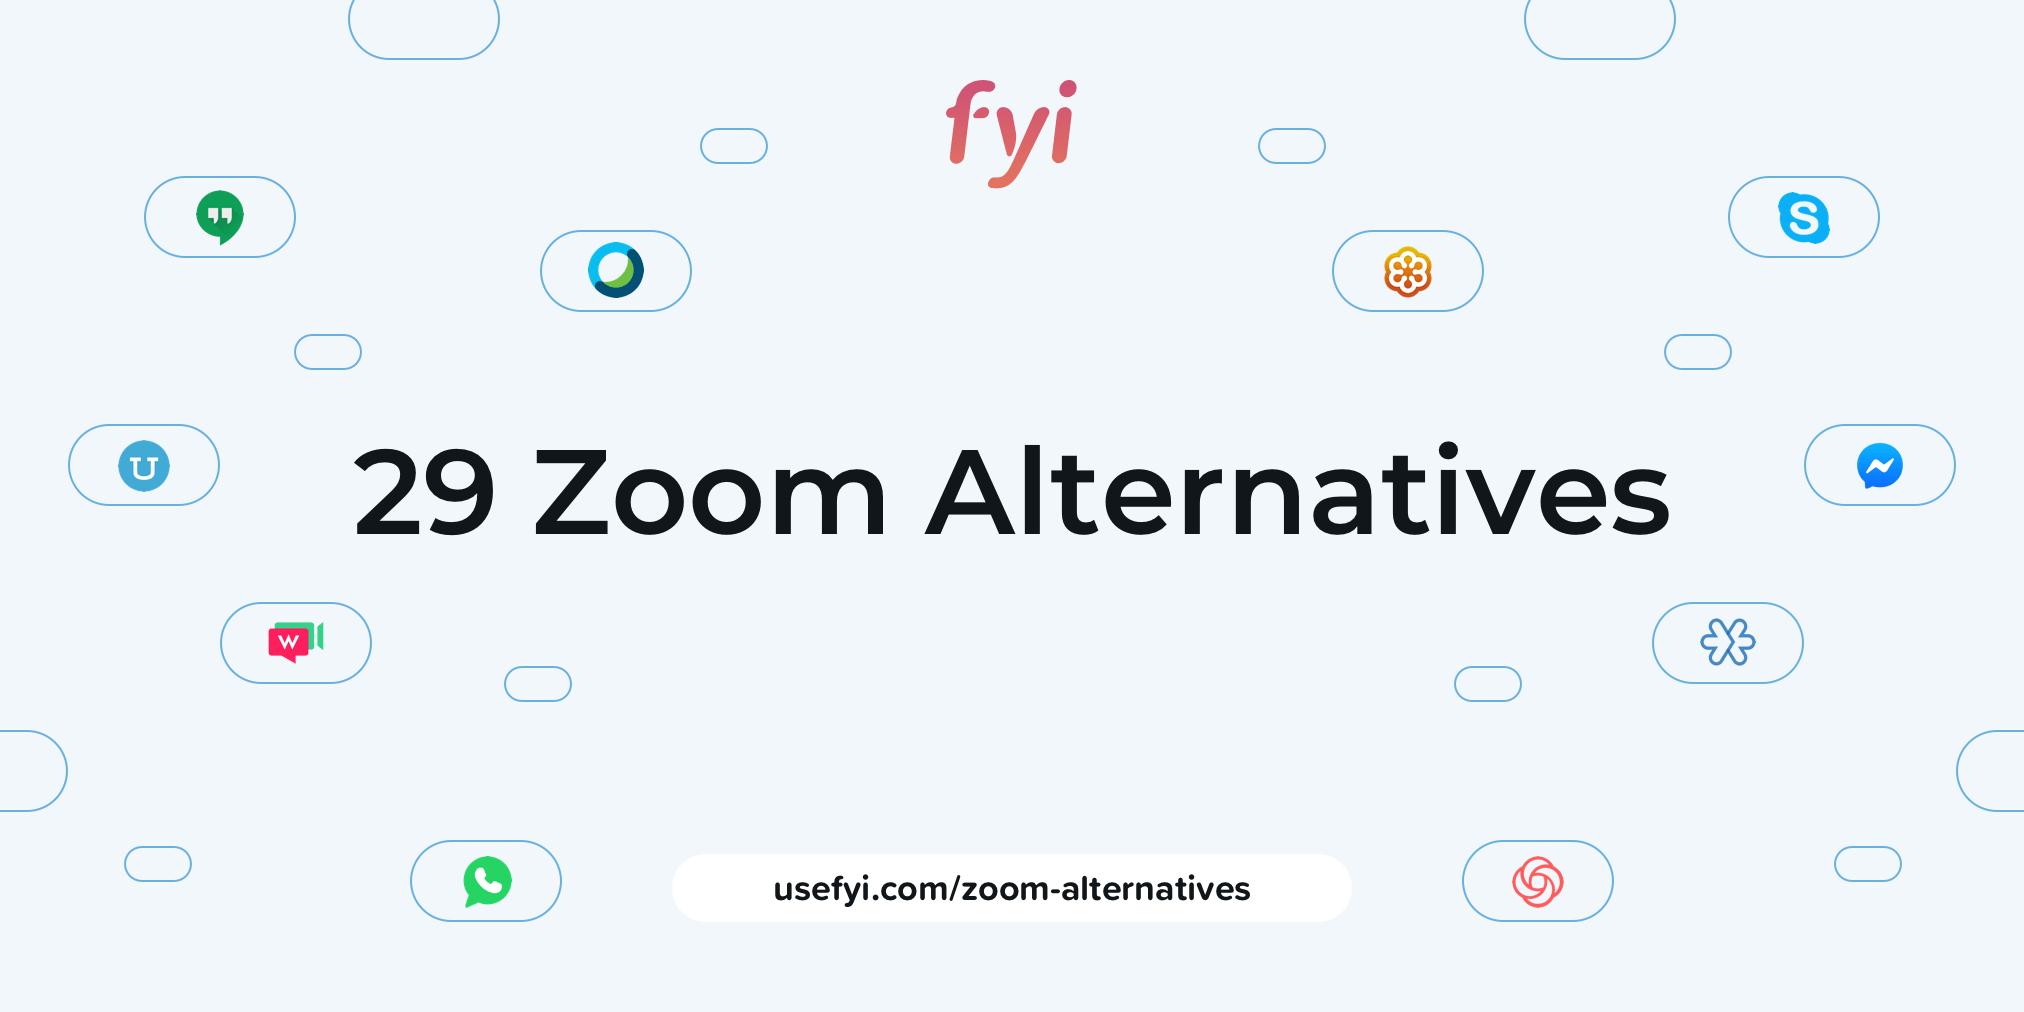 Zoom alternatives cover image